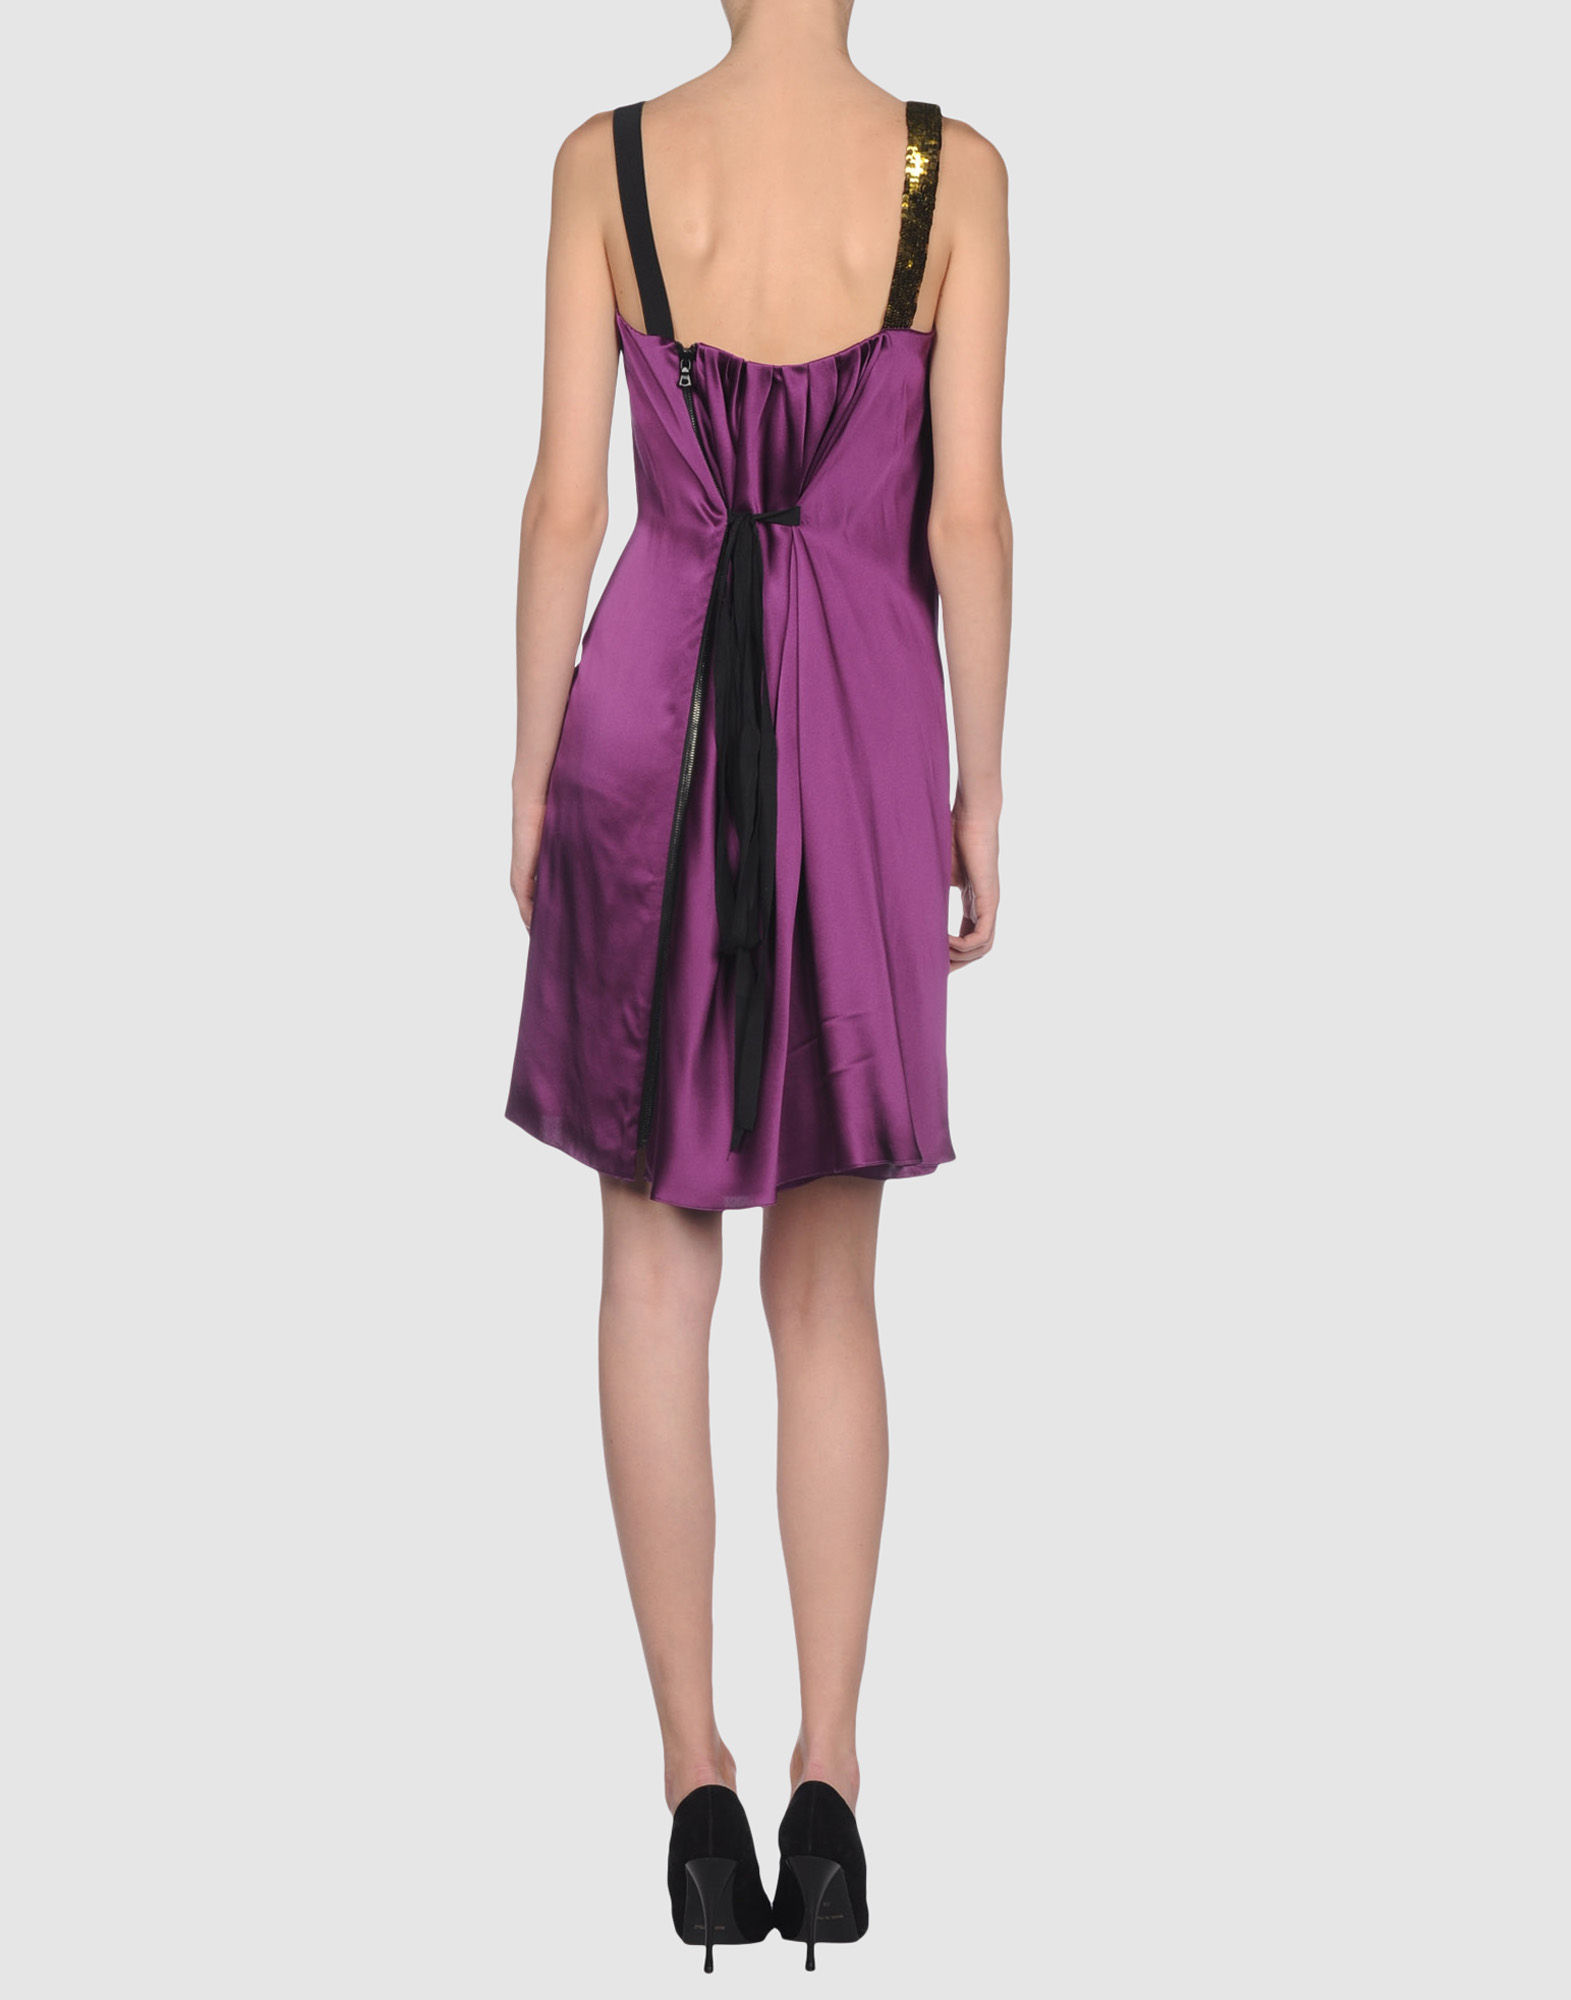 34212532CO 14 r - Evening Φορεματα Vera Wang 2011 2012 Κωδ.04